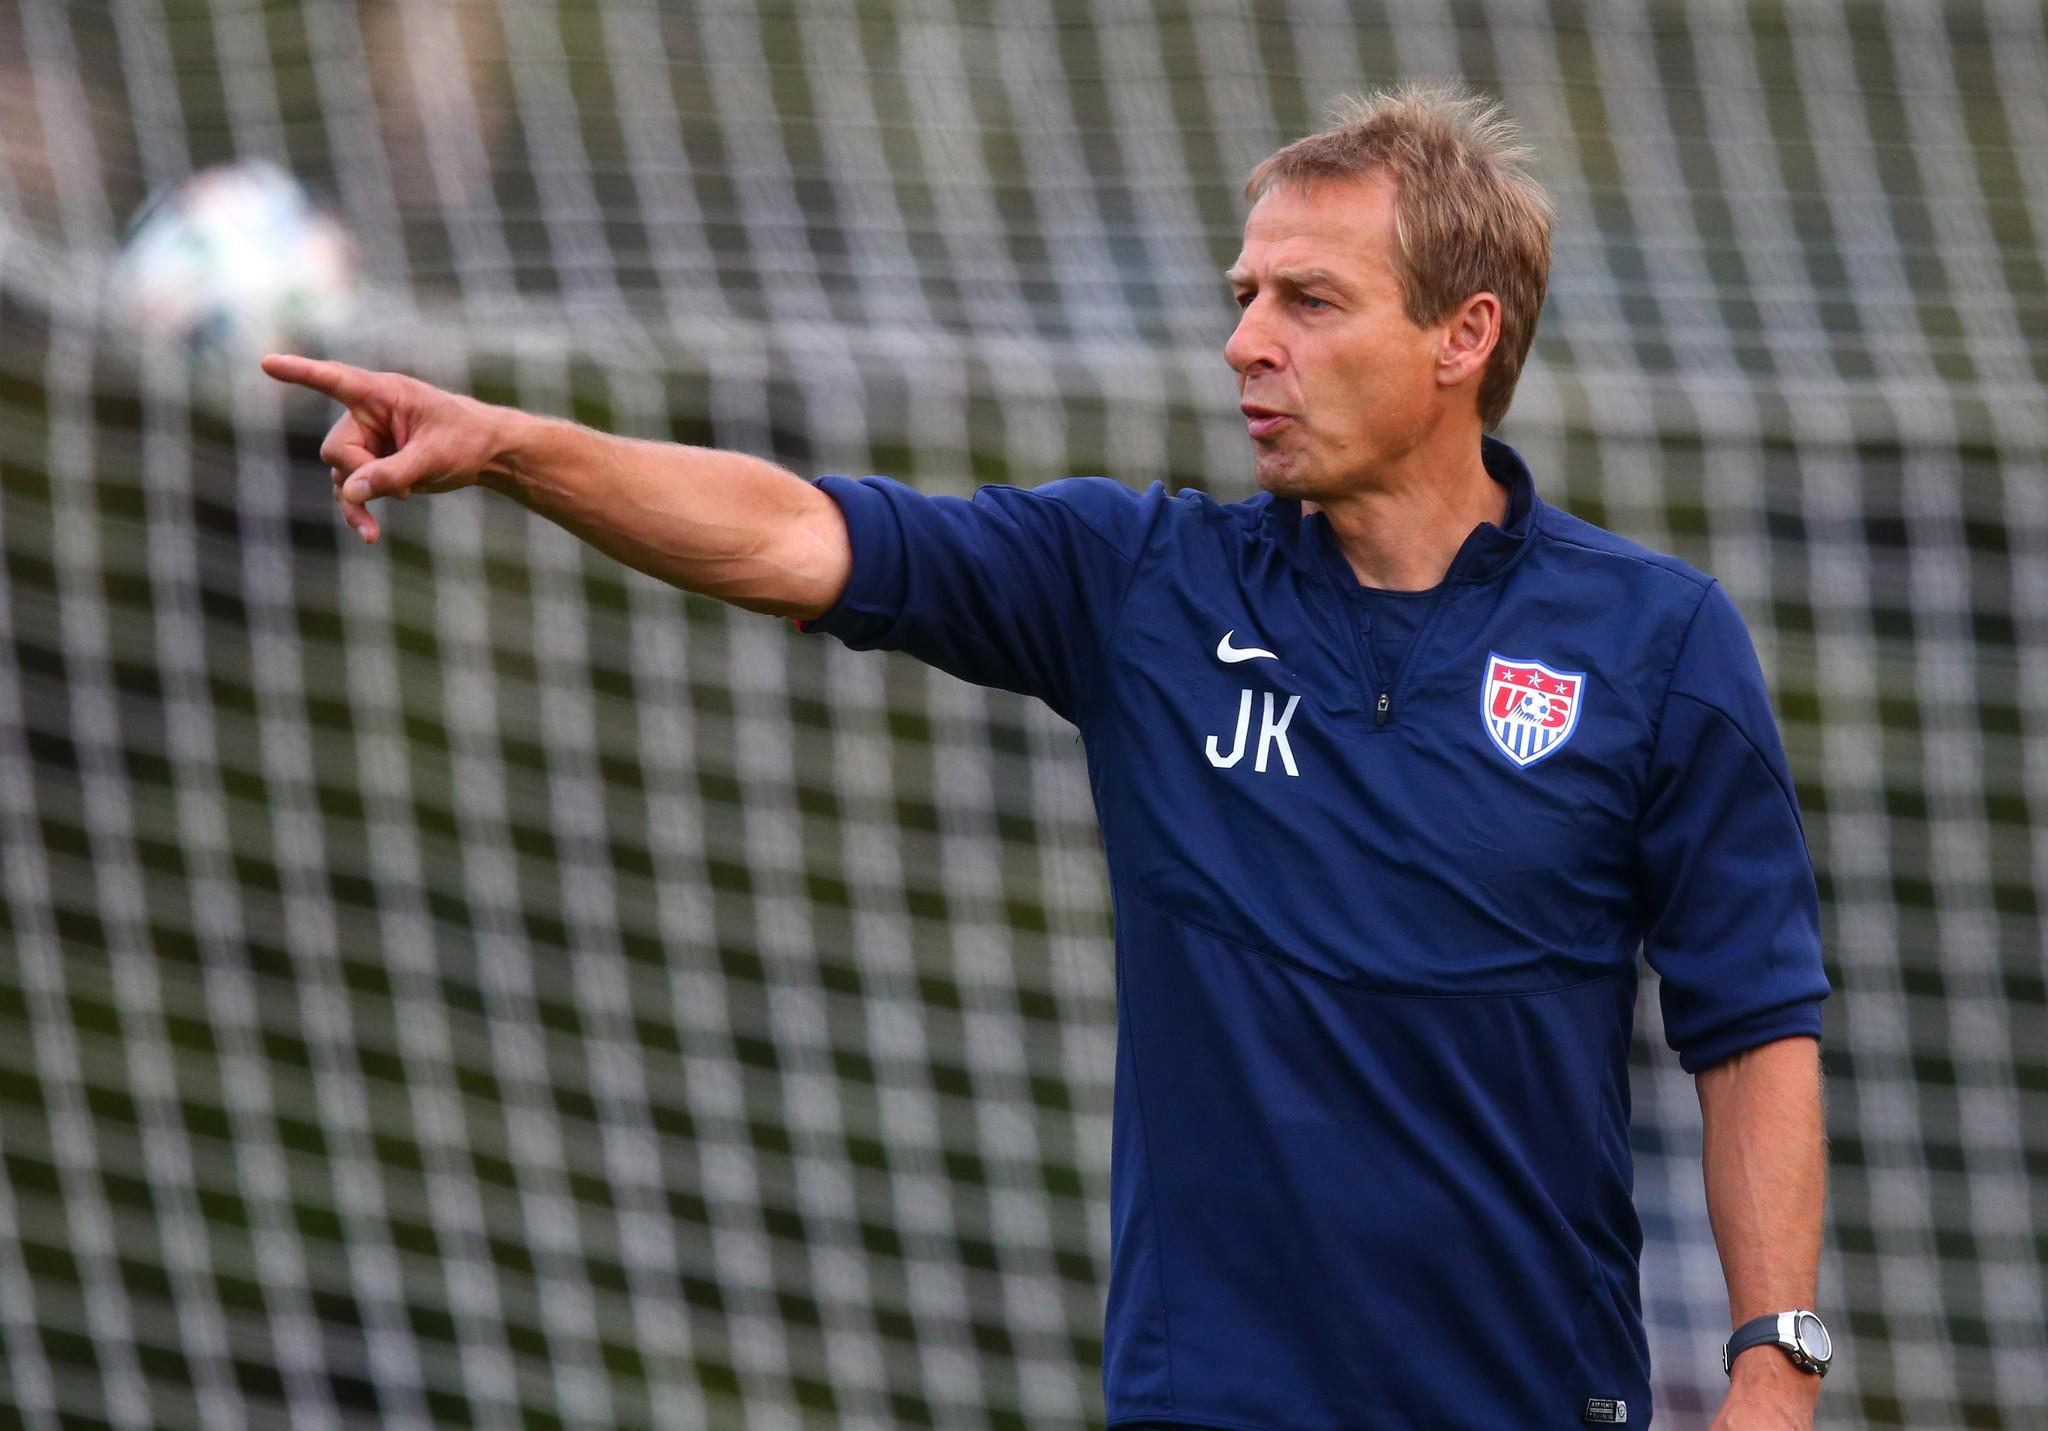 U.S. coach Jurgen Klinsmann reacts during team training at Sao Paulo FC.